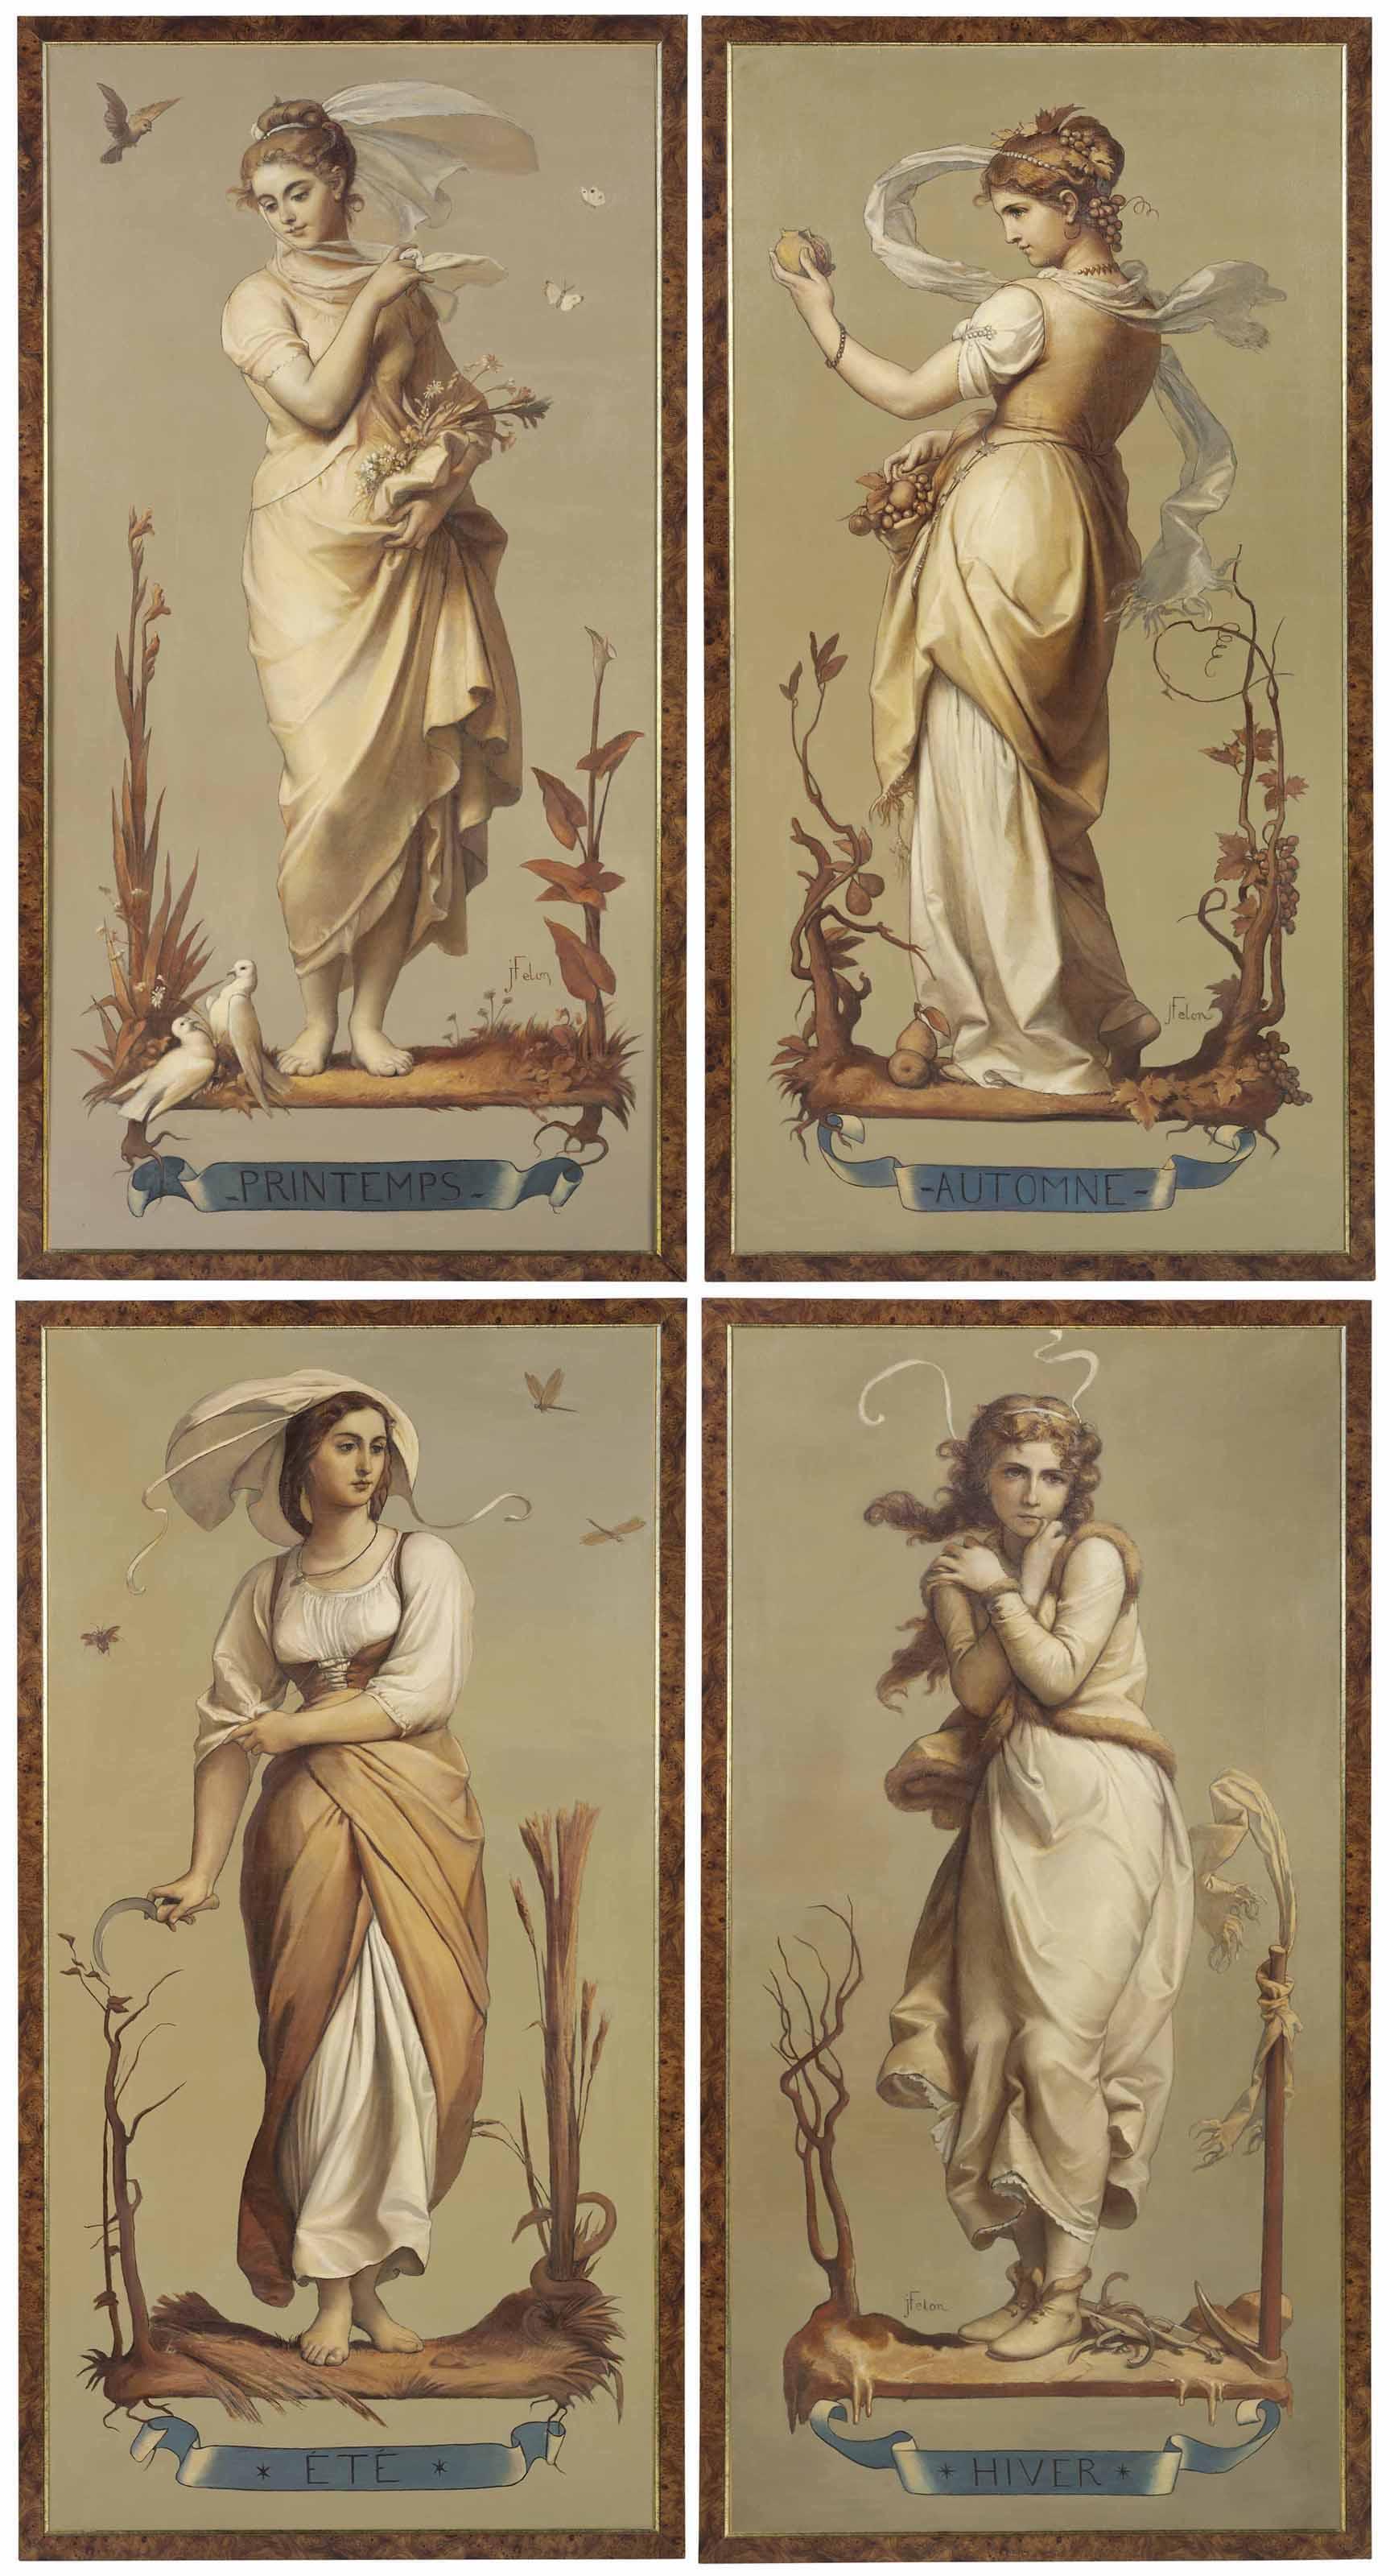 JOSEPH FELON (FRENCH, 1818-1896)